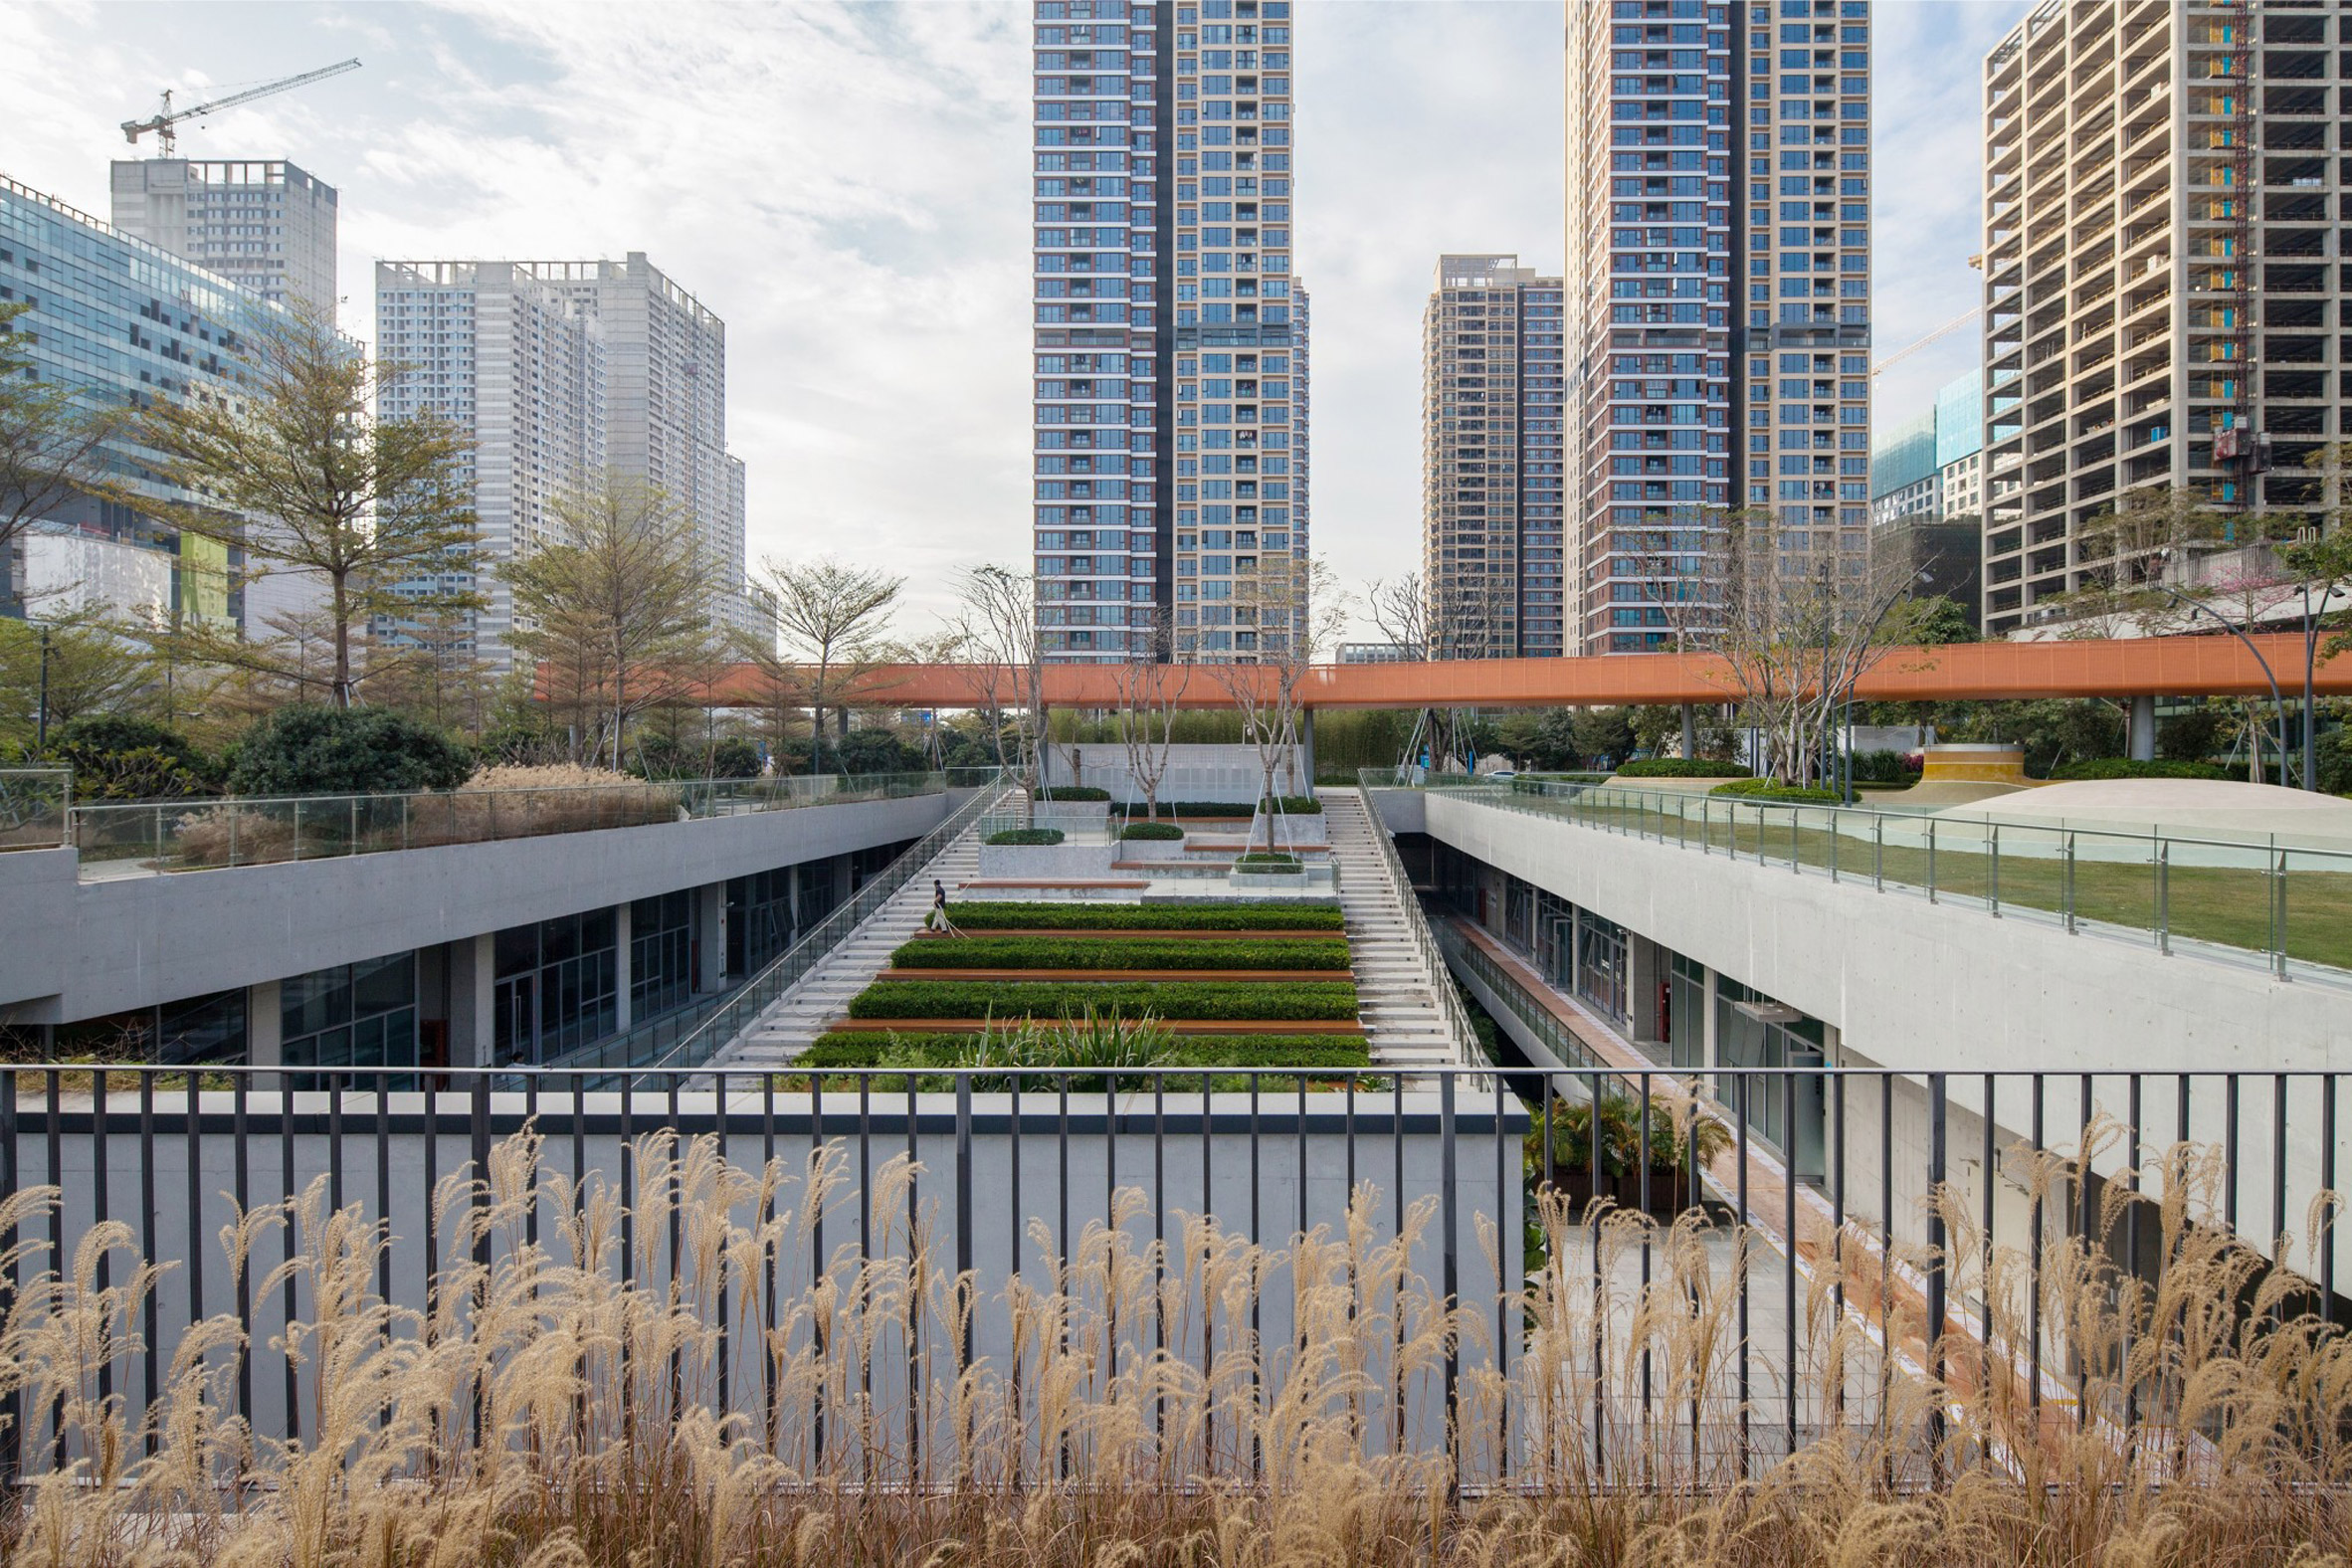 Vanke Design Community Liuxiandong Plot A4 B2 by fcha